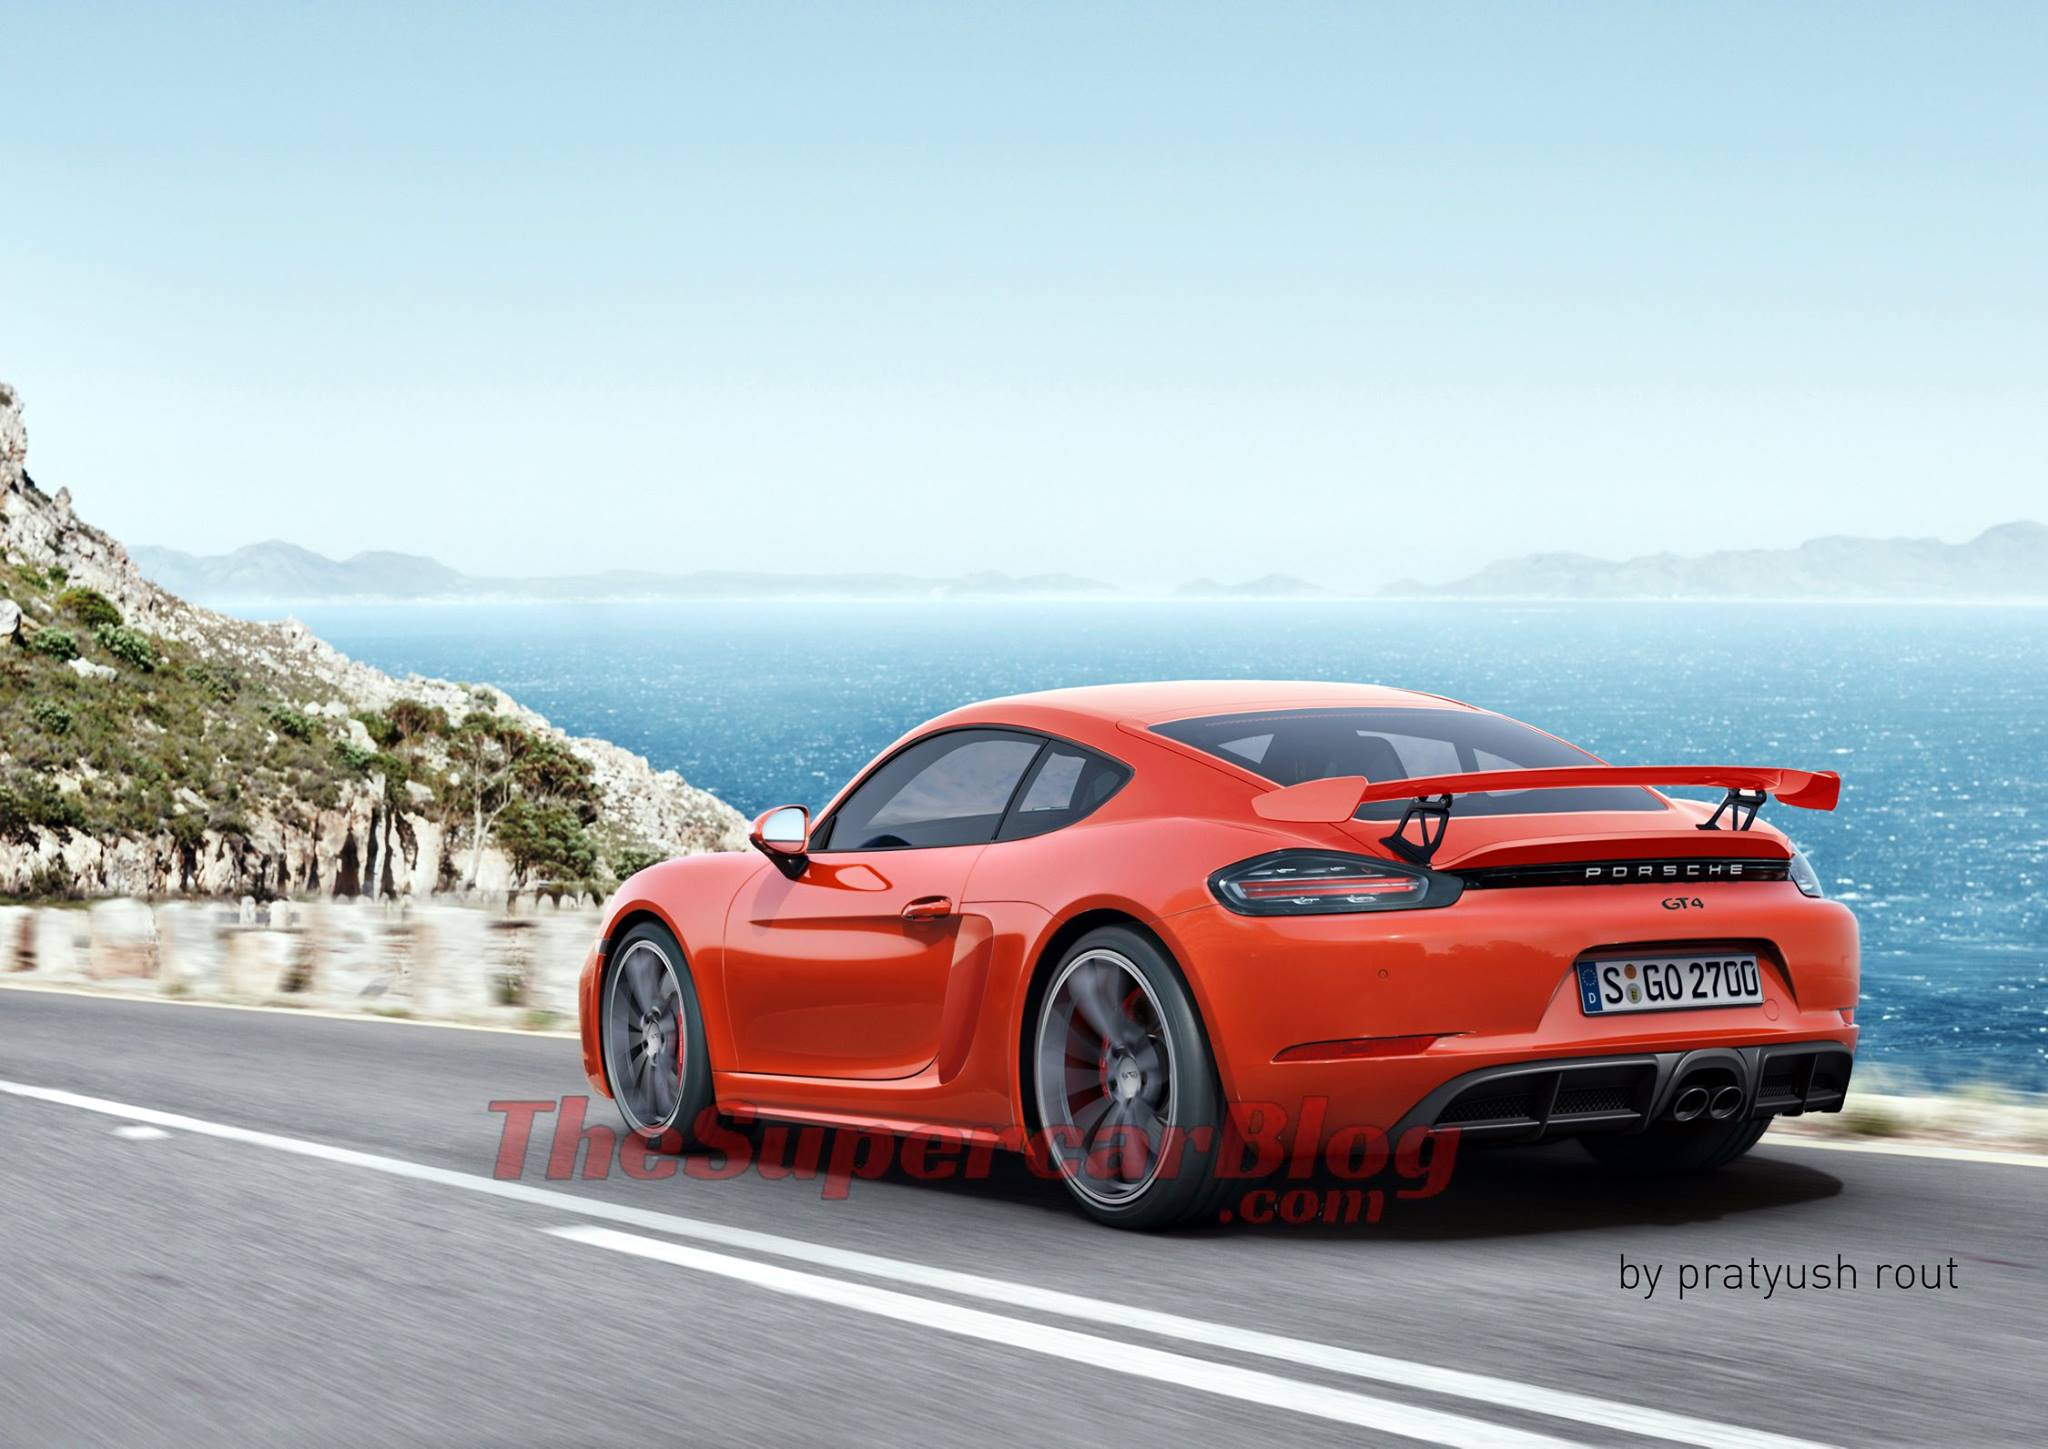 Next-Gen Porsche 718 Cayman GT4 rendering